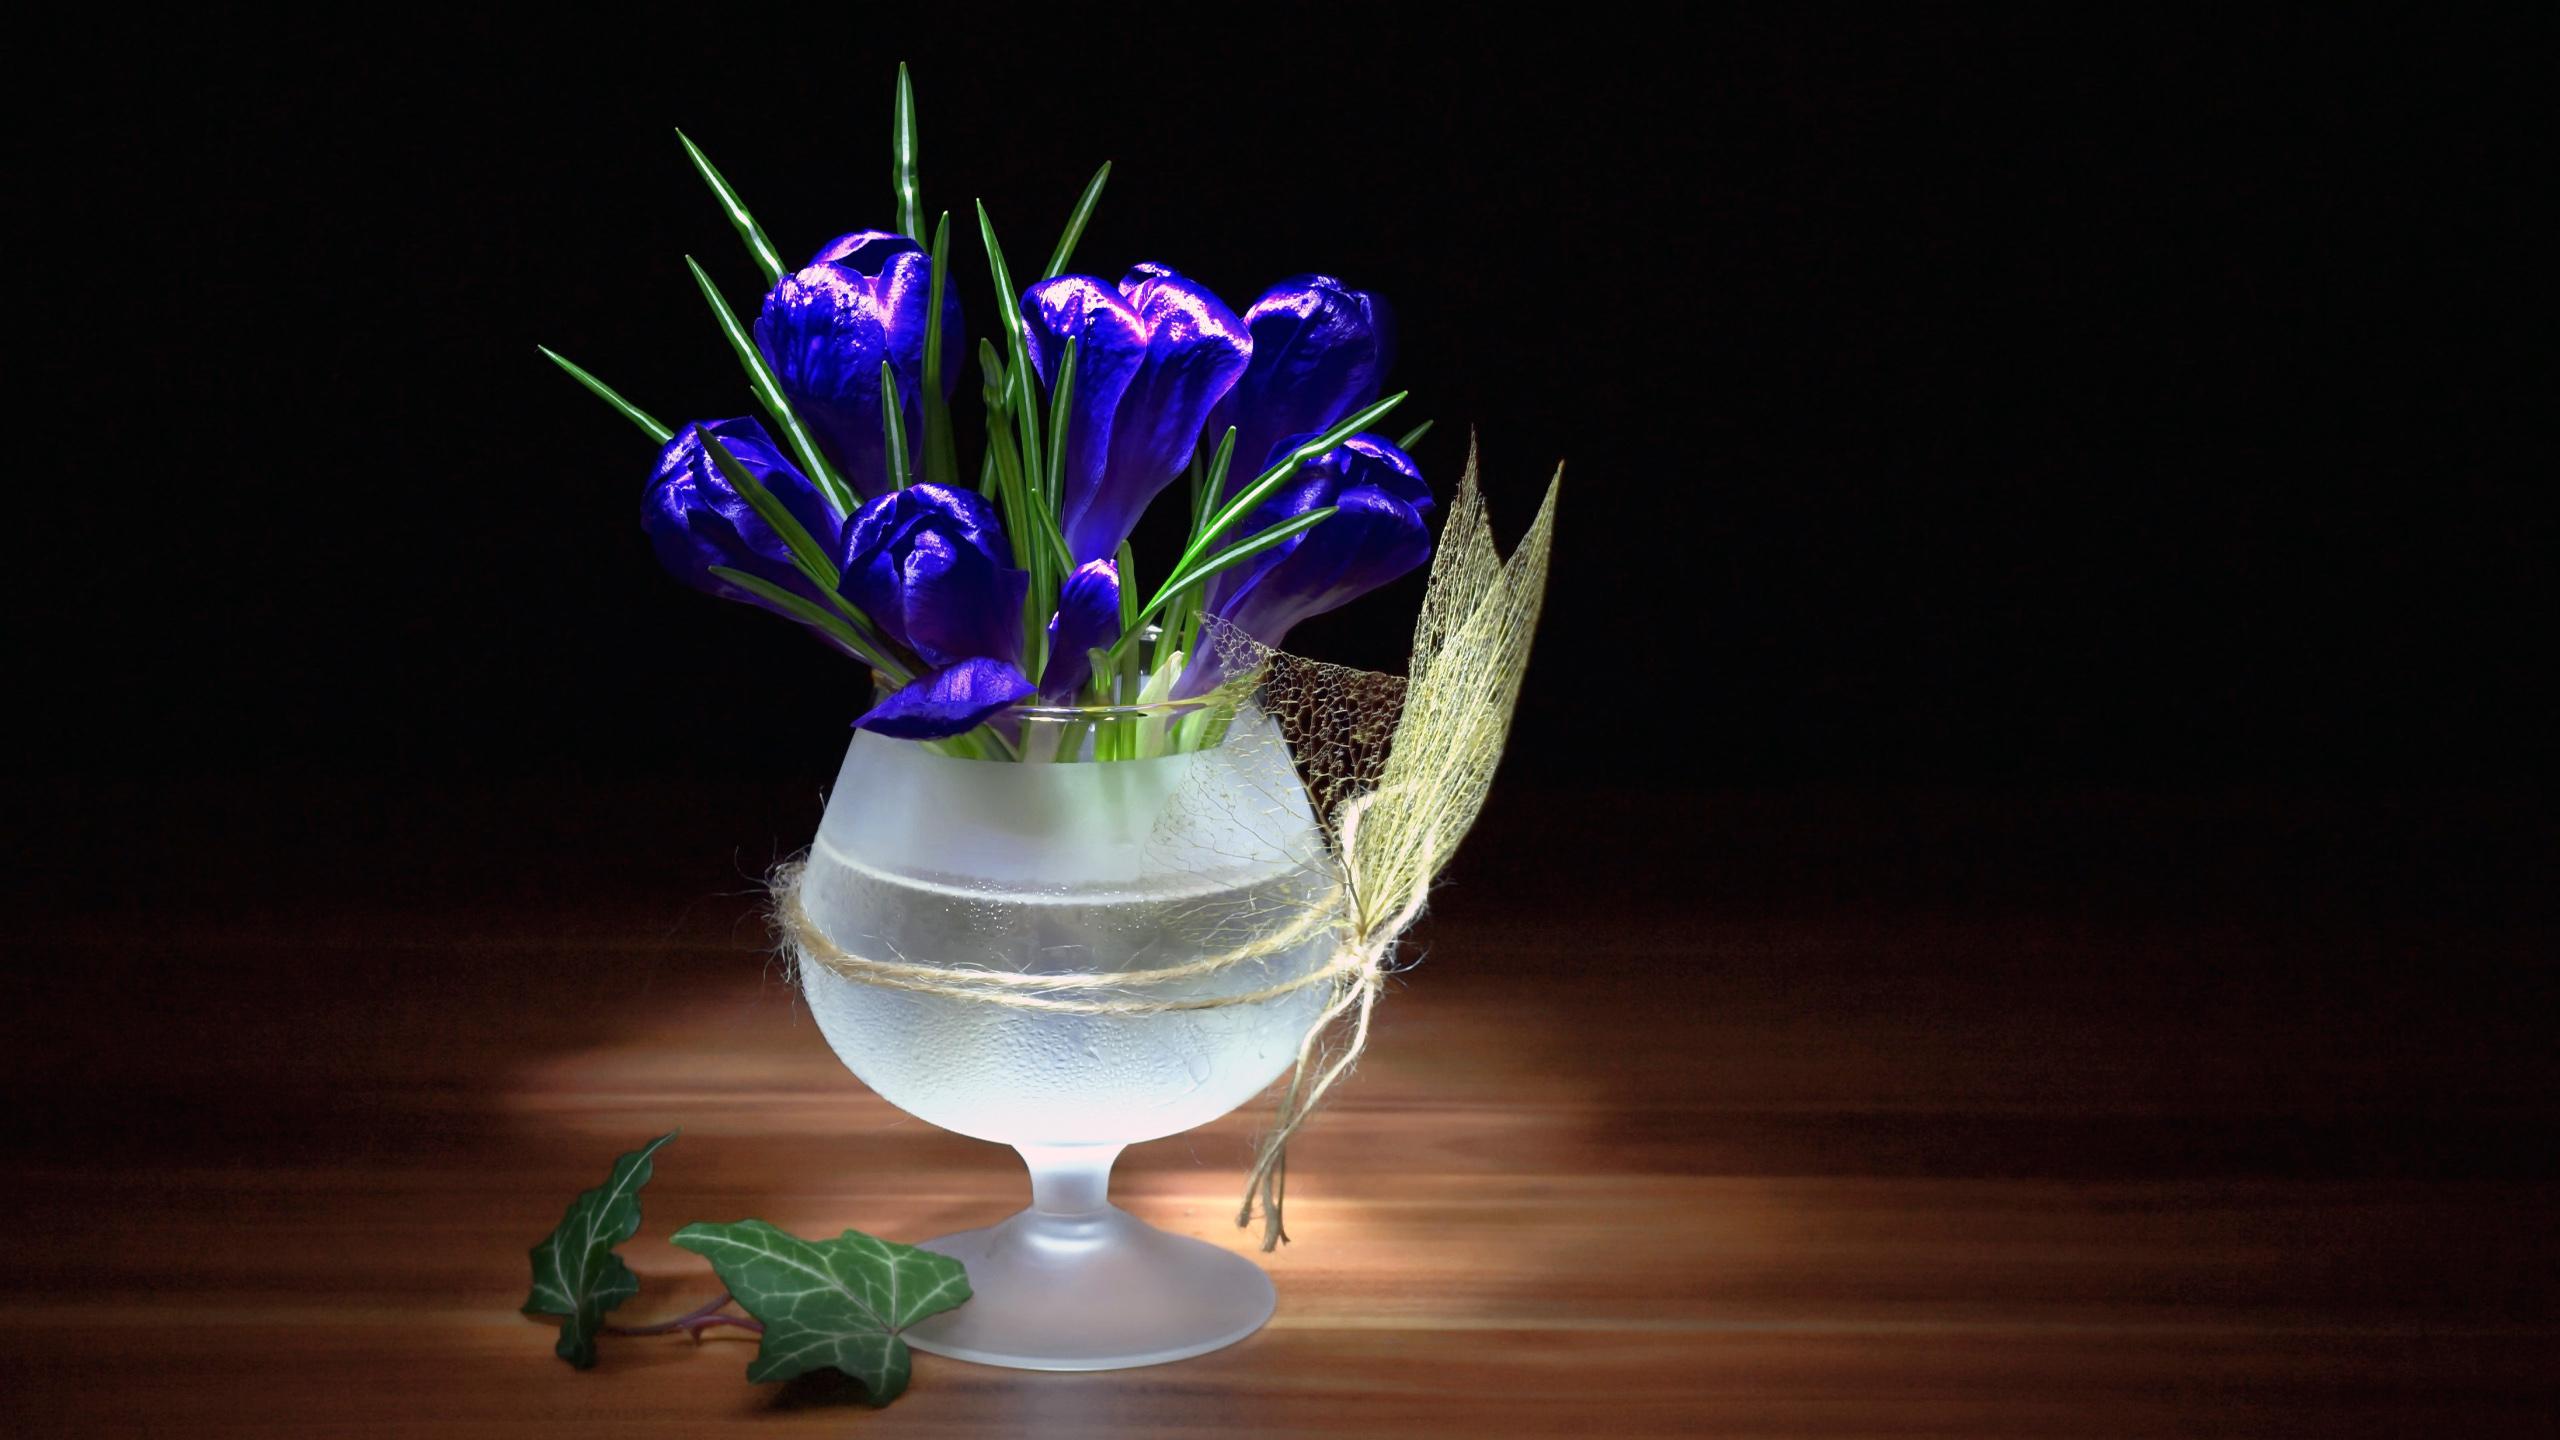 HDoboi.Kiev.ua - Синие крокусы, цветы в вазе обои на рабочий стол, hd заставки